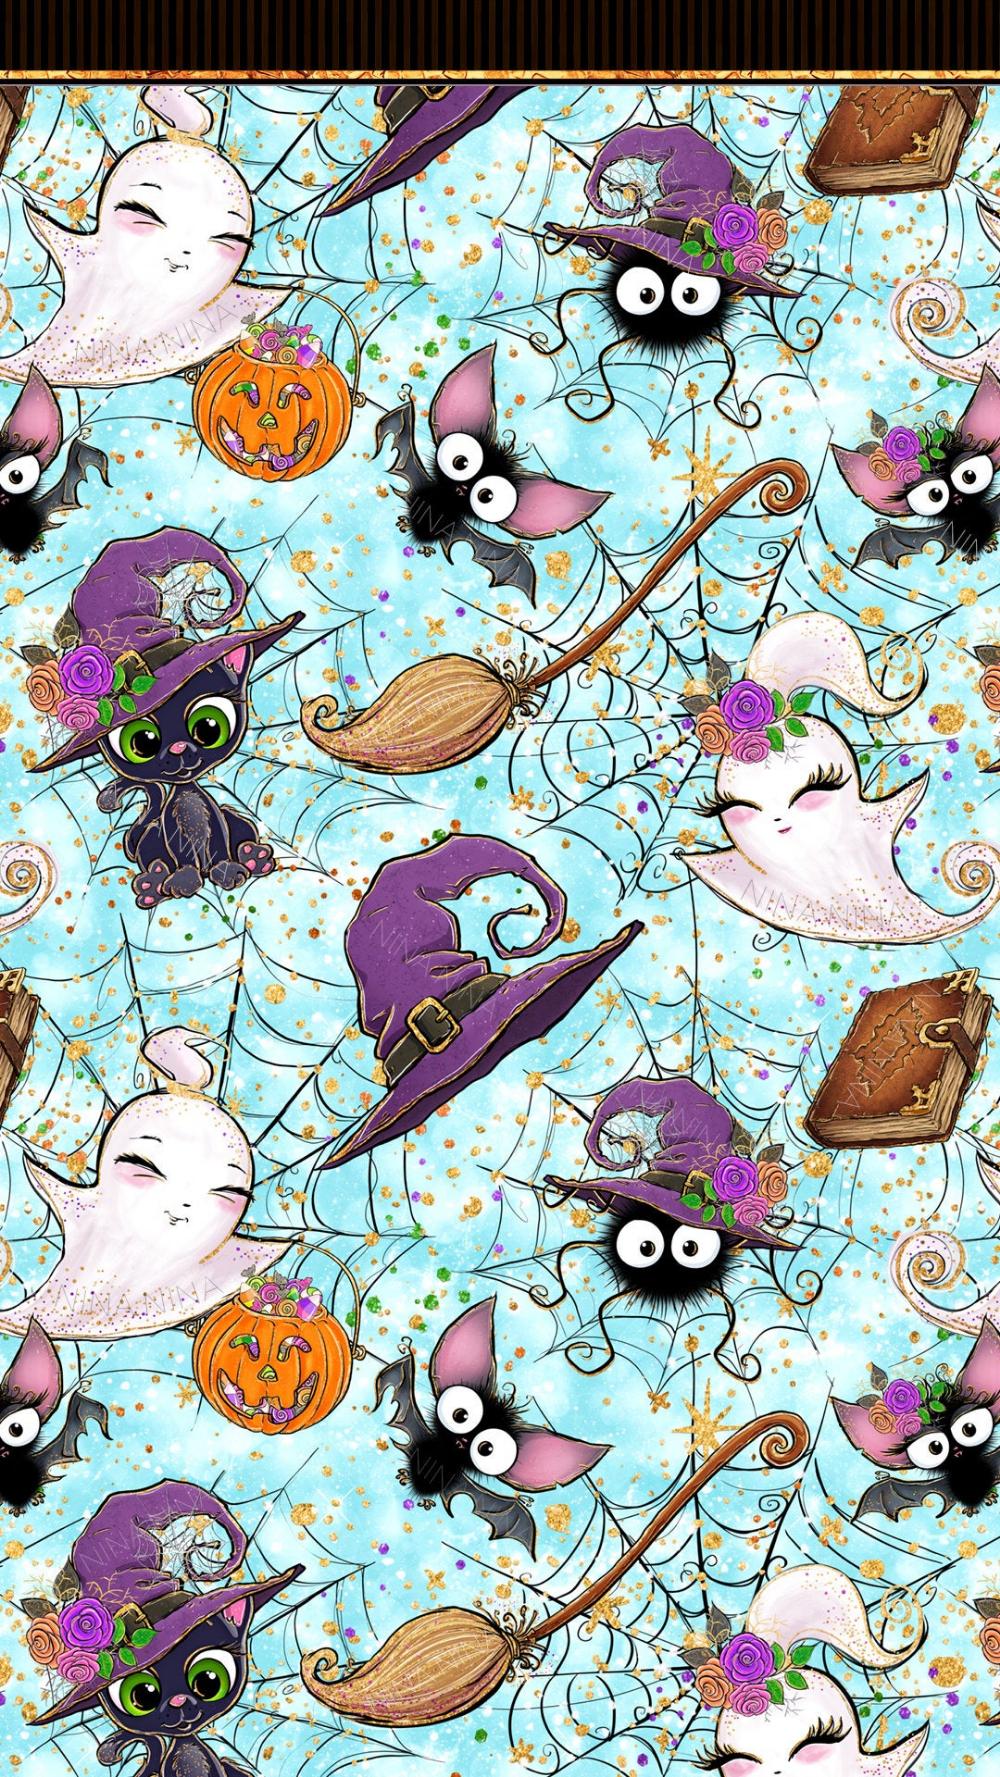 Cute Halloween Digital Papers Halloween Seamless Patterns Spooky Fabric Patterns In 2020 Halloween Wallpaper Iphone Halloween Wallpaper Backgrounds Halloween Digital